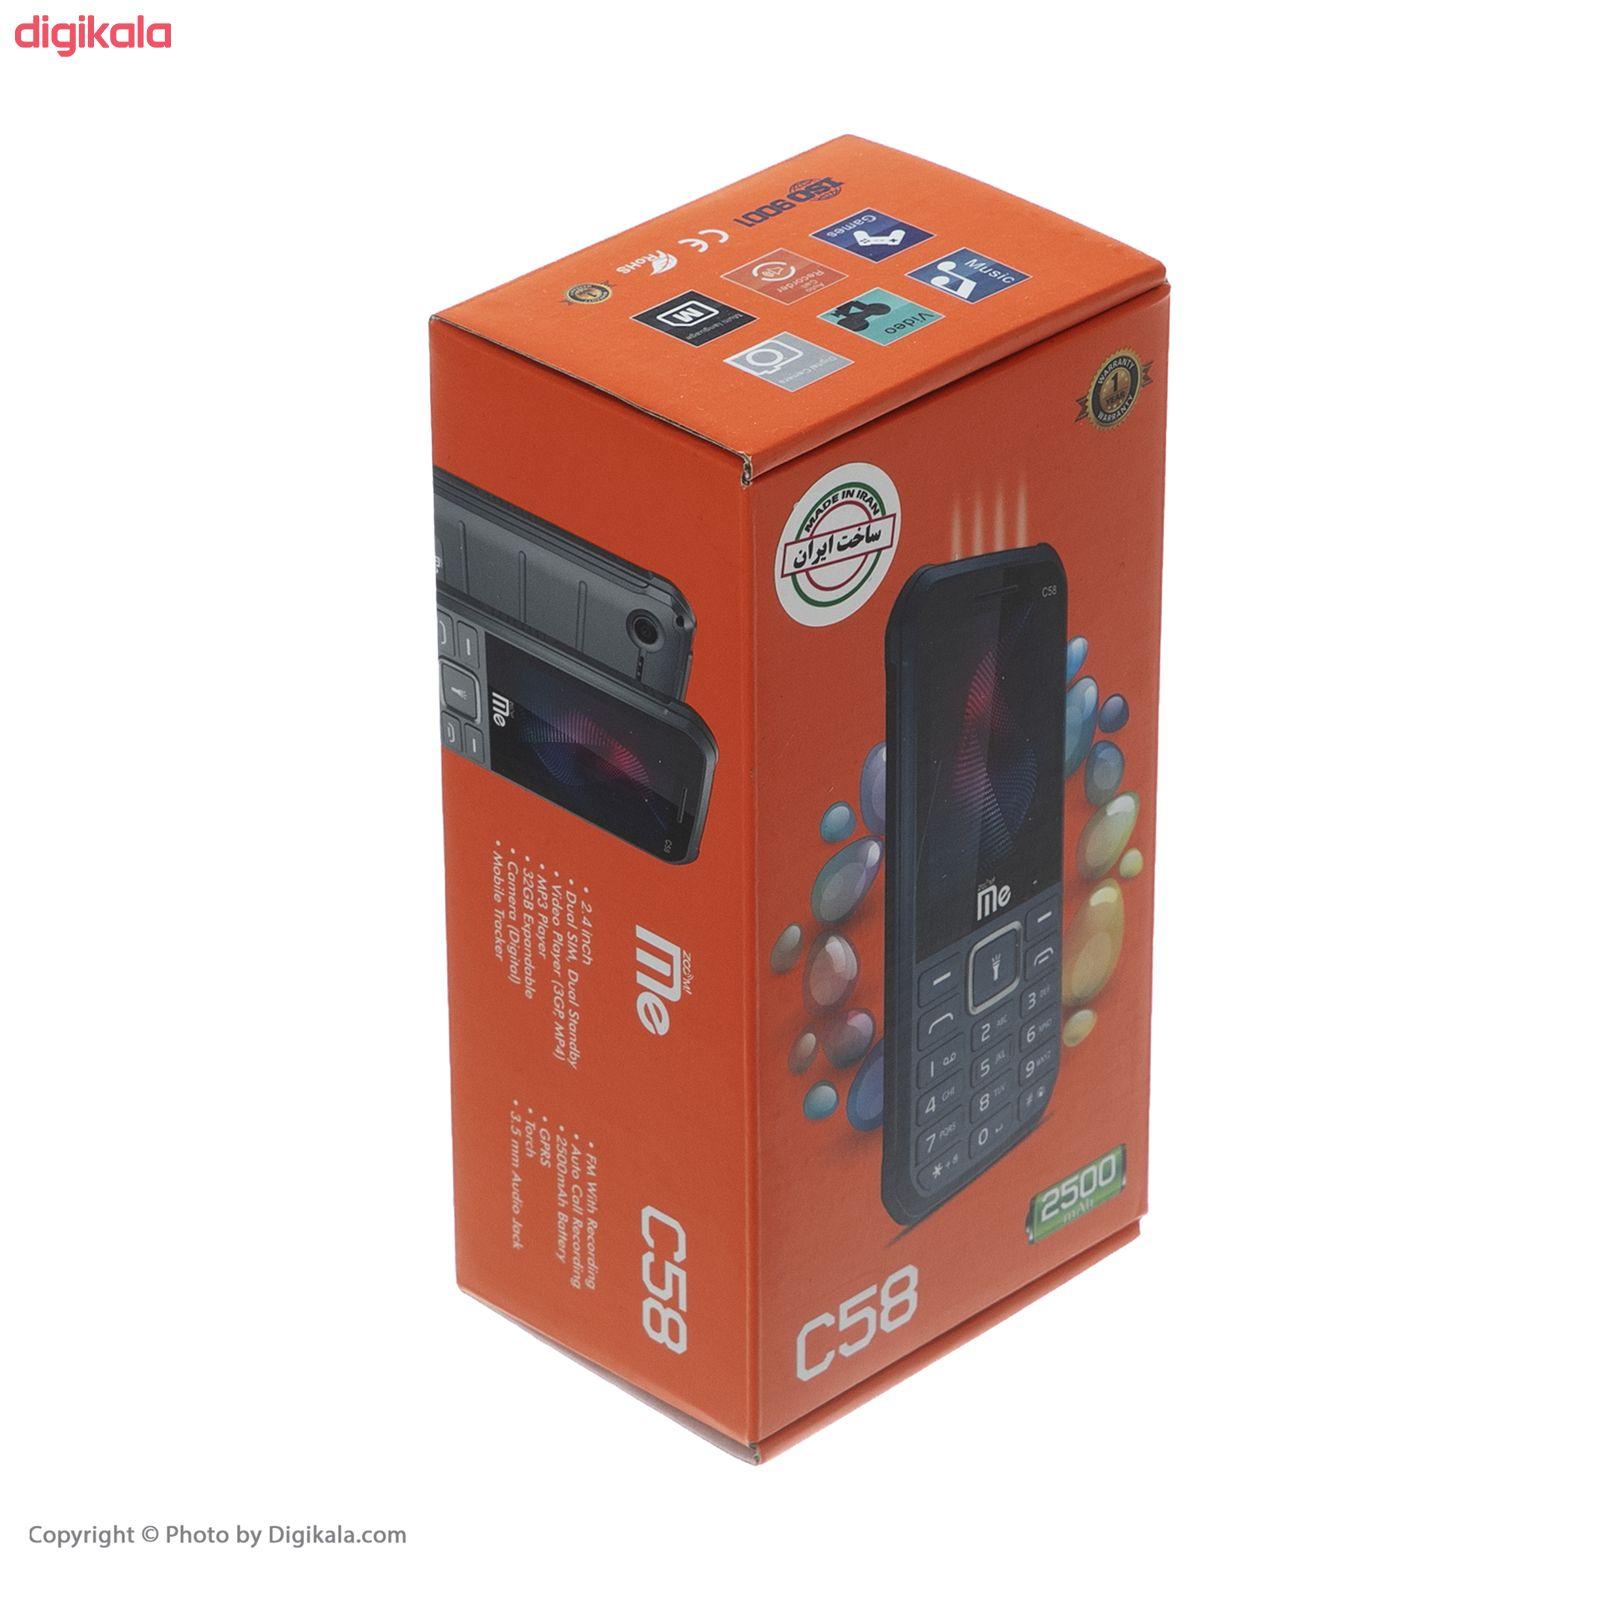 گوشی موبایل جی ال ایکس مدل Zoom me C58 دو سیم کارت main 1 20